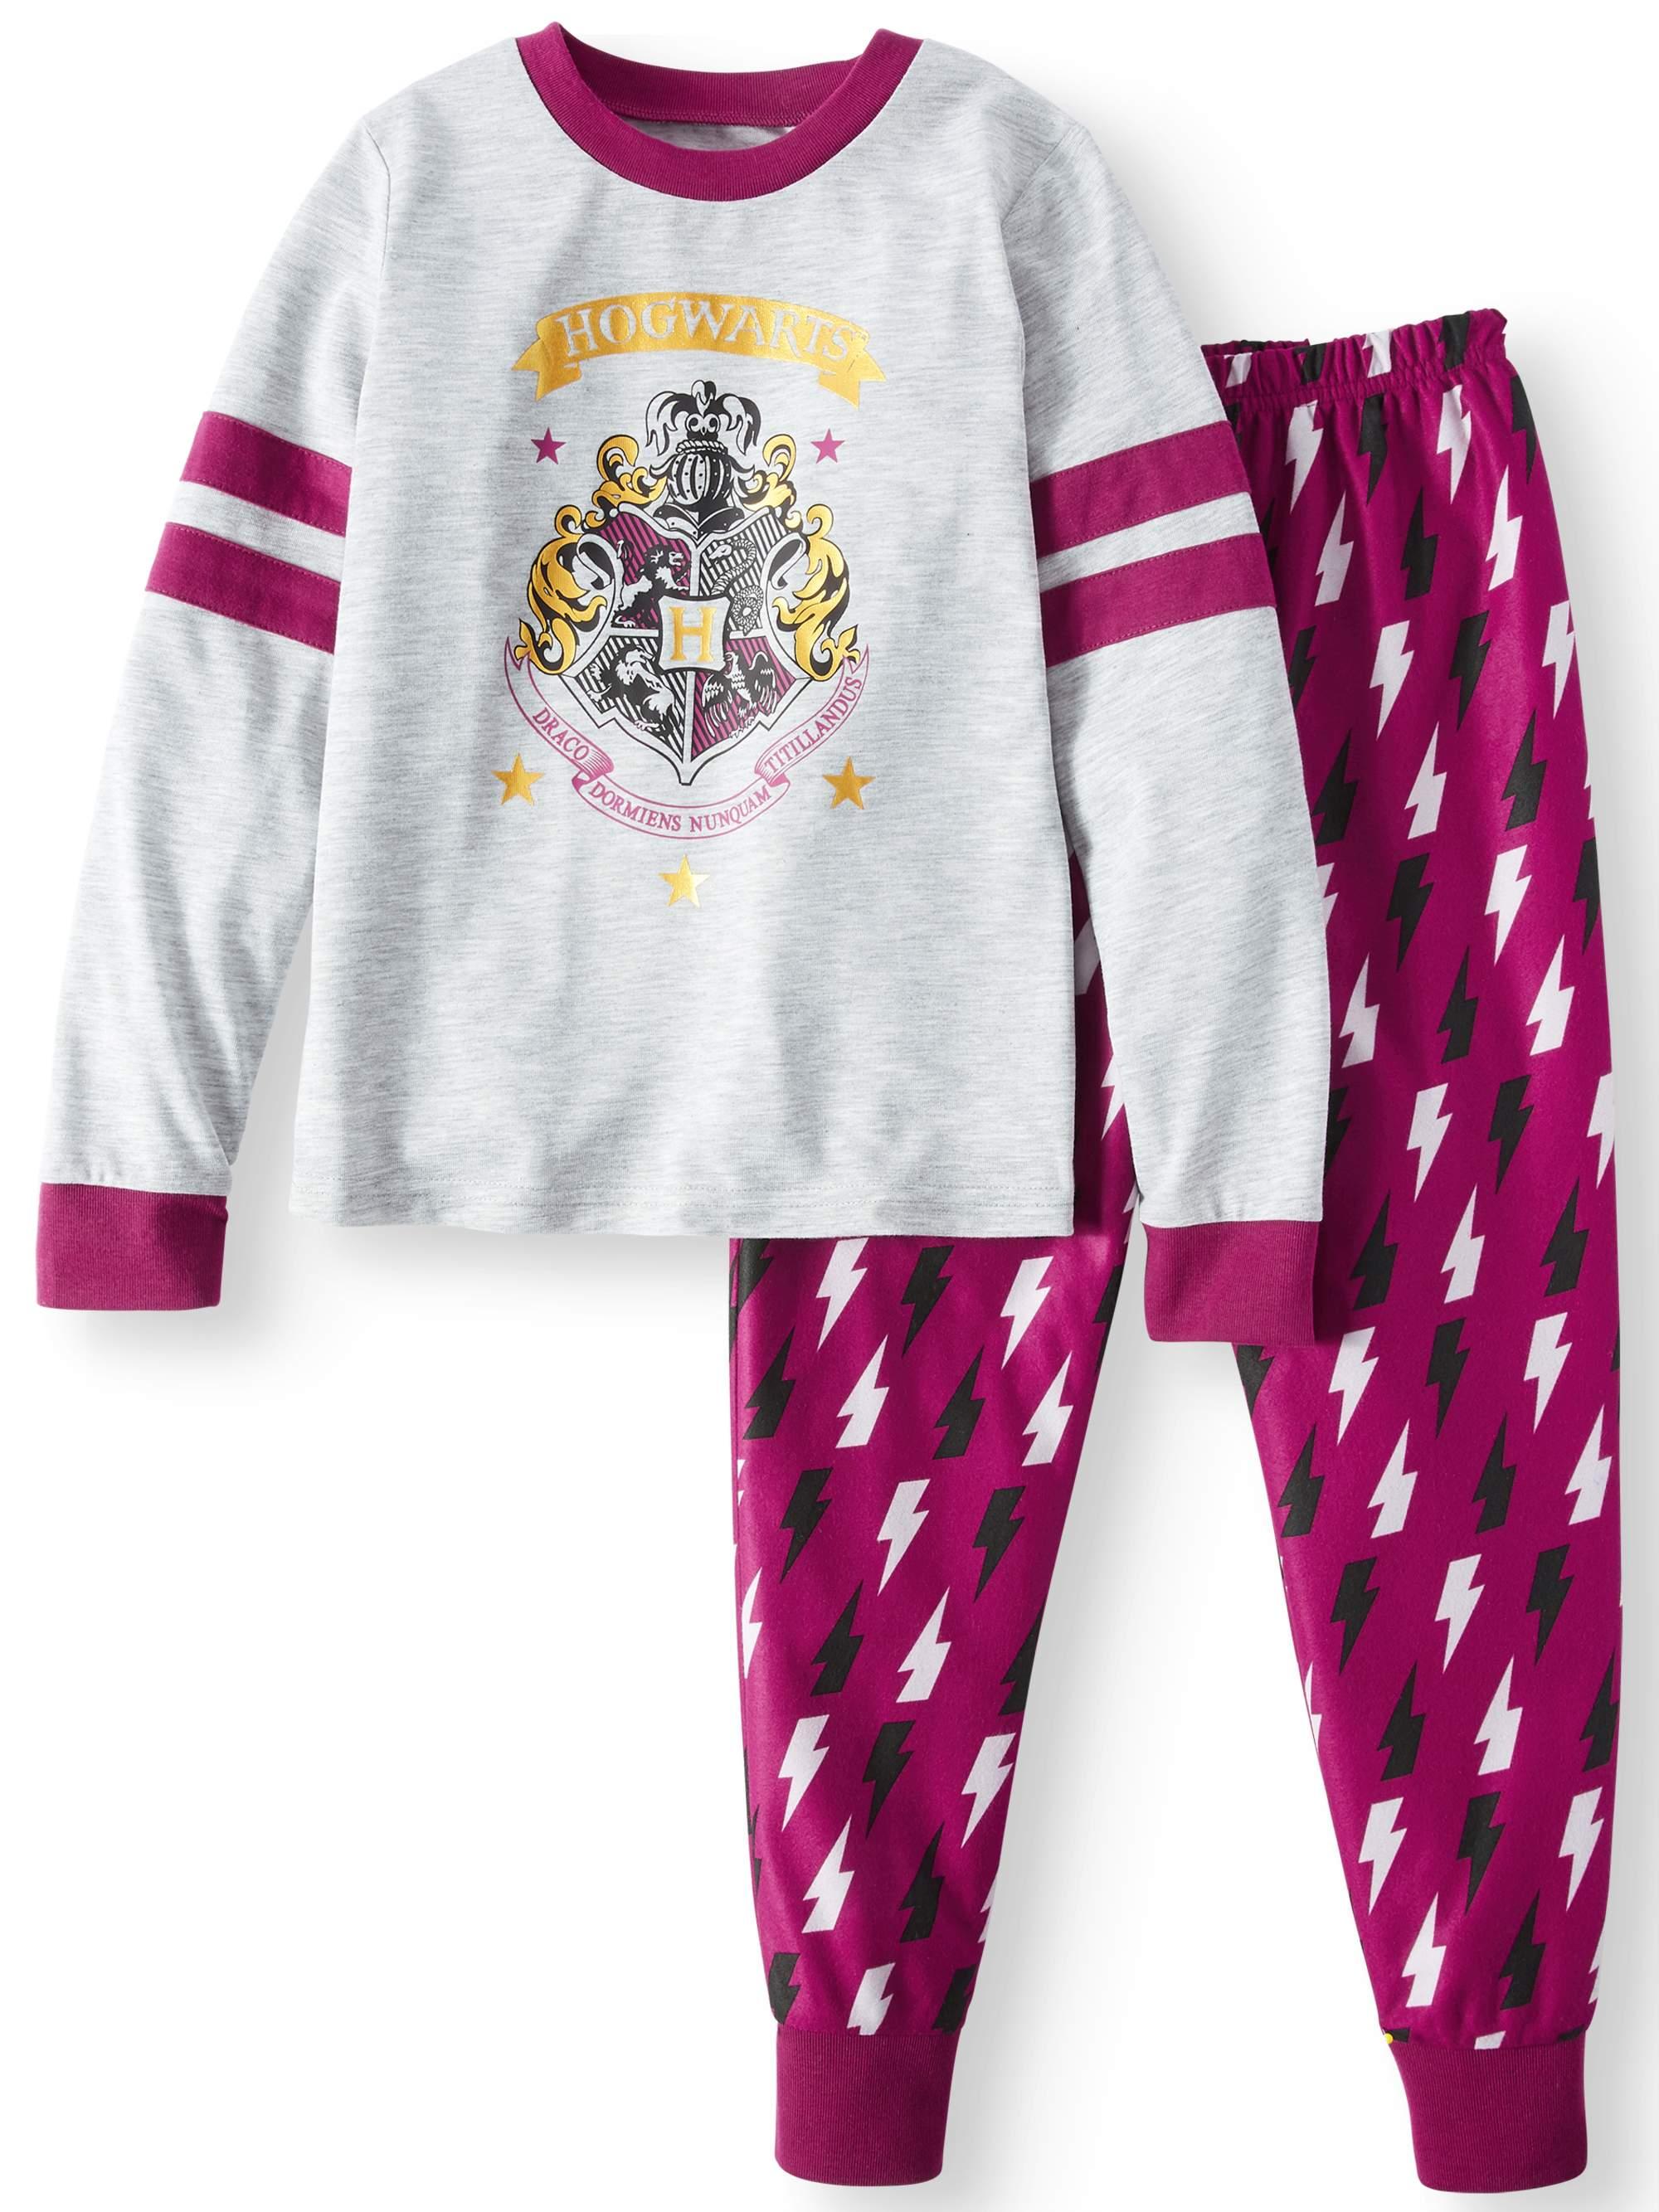 Harry Potter Girls' Pajama Sle...